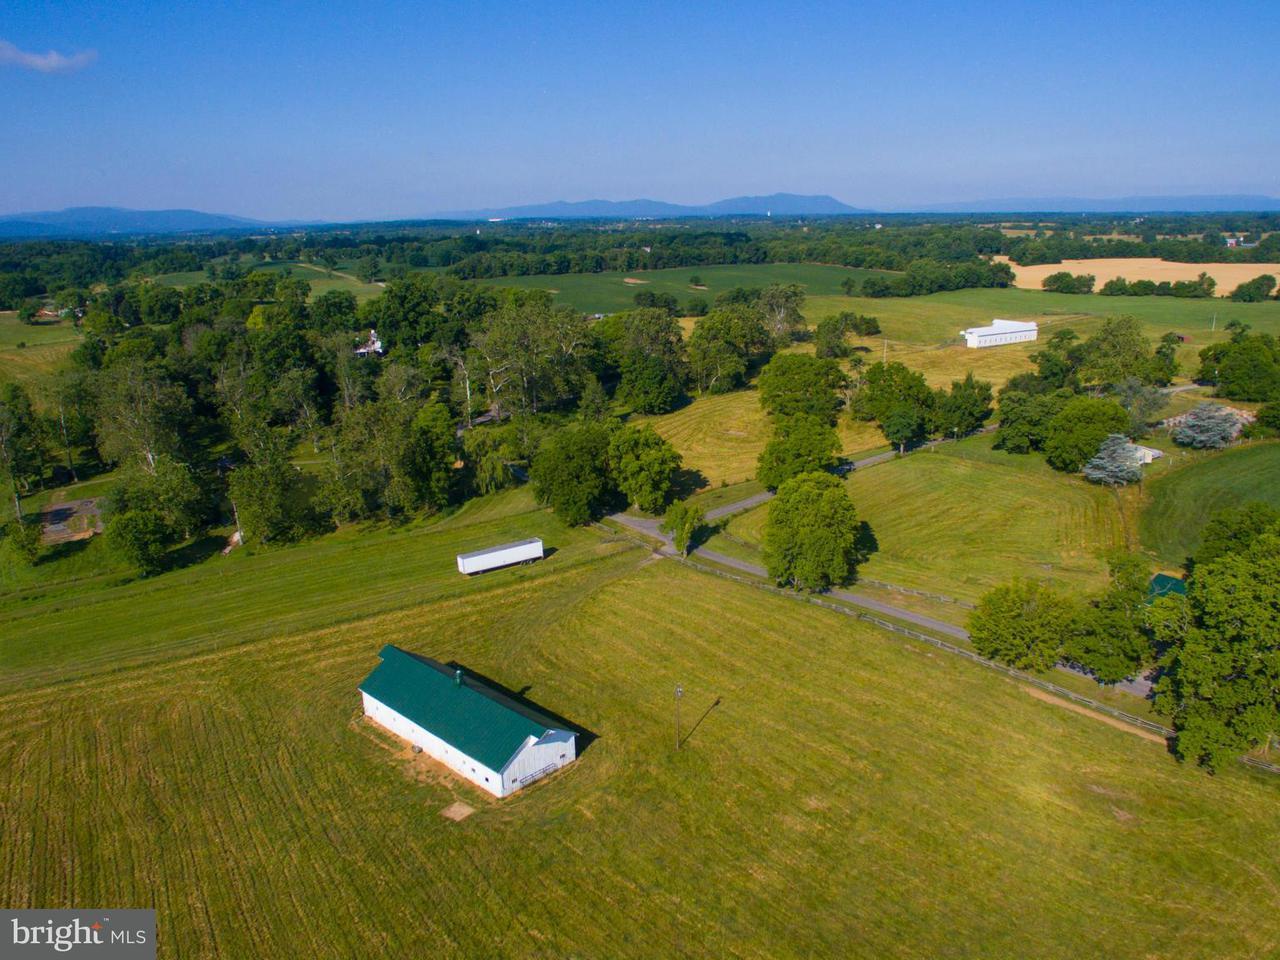 Additional photo for property listing at 466 Montana Hall Ln S 466 Montana Hall Ln S White Post, 弗吉尼亞州 22663 美國